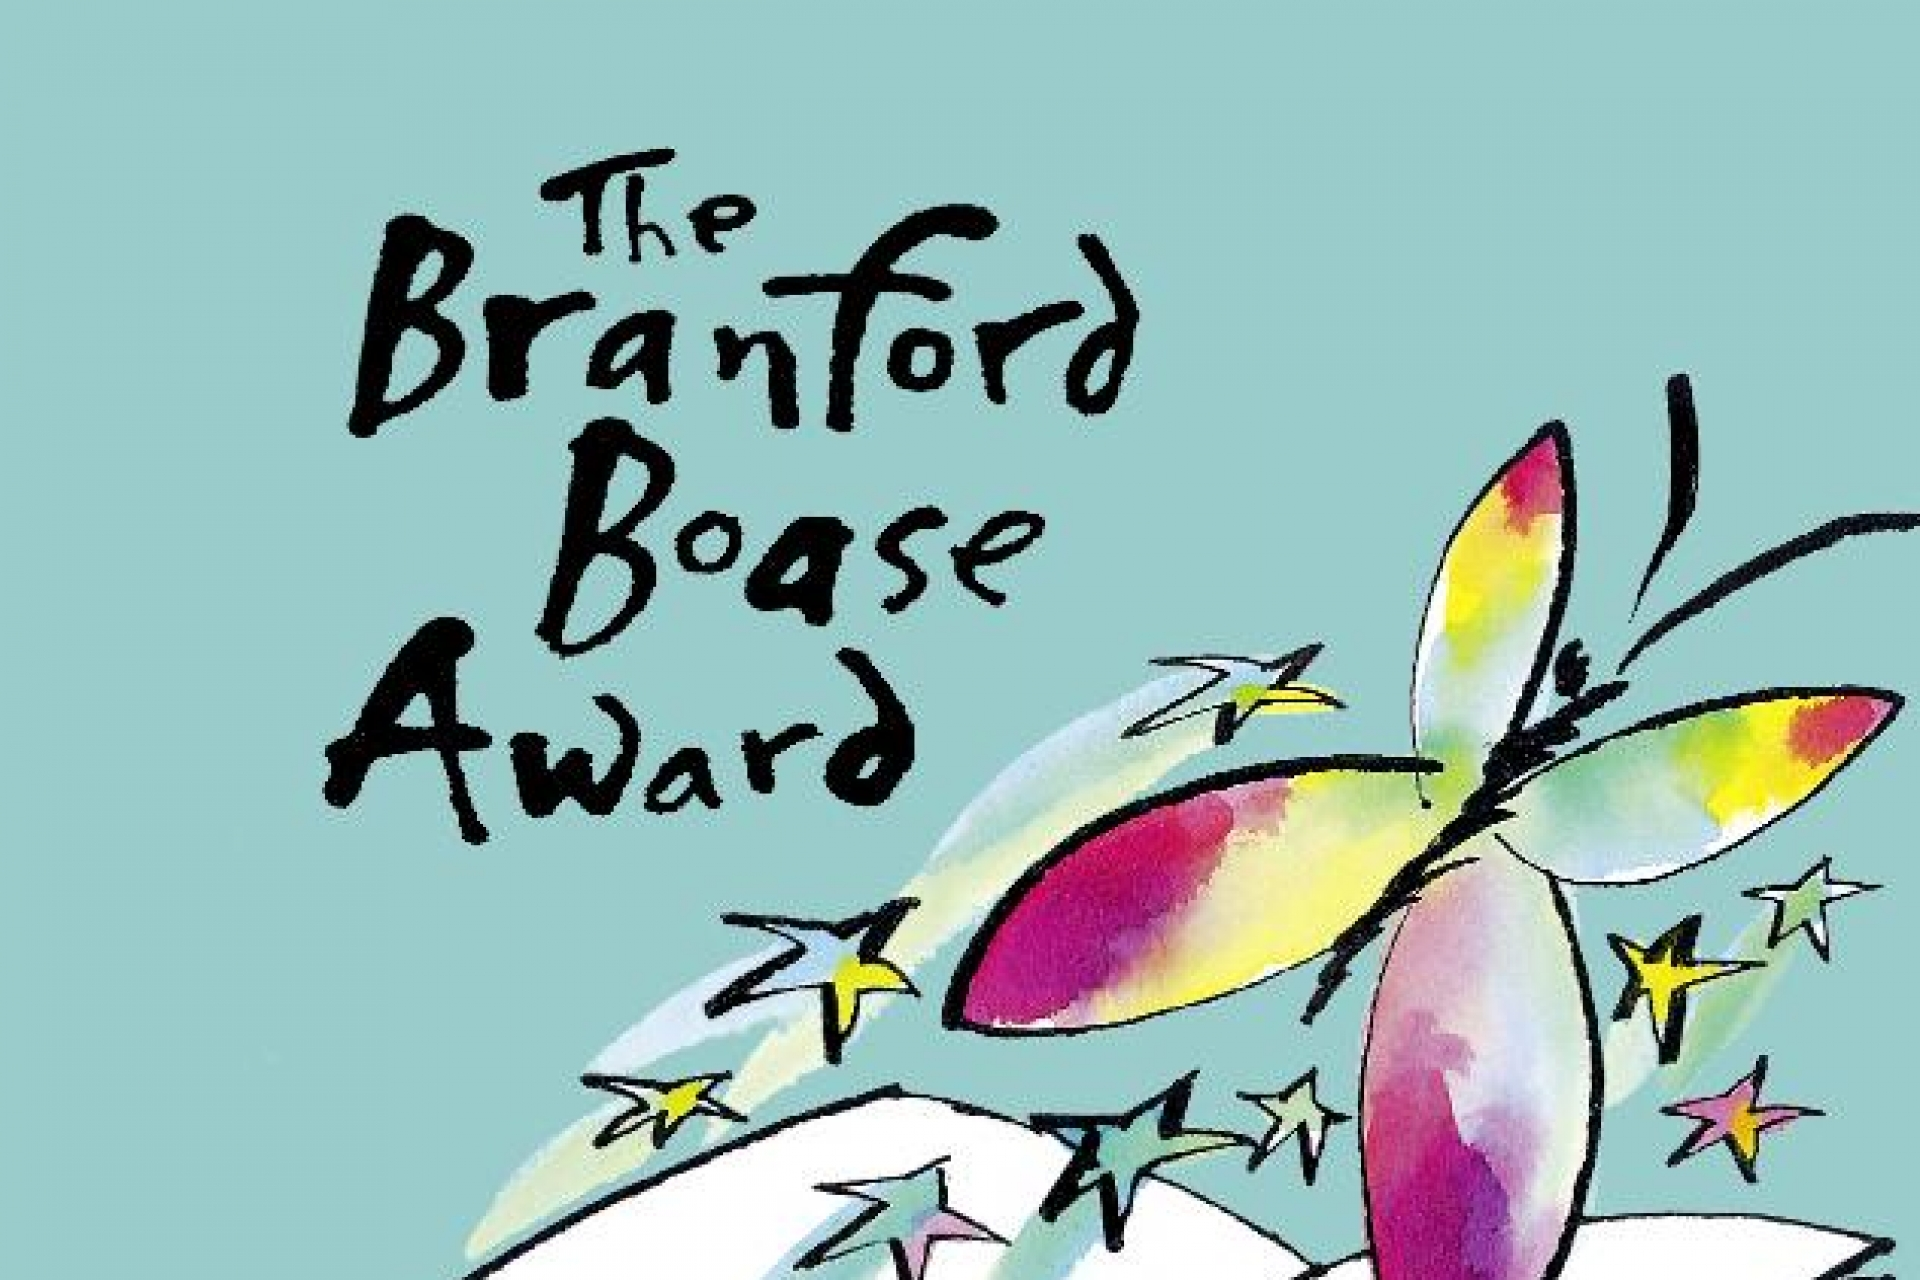 The Branford Boase Award logo